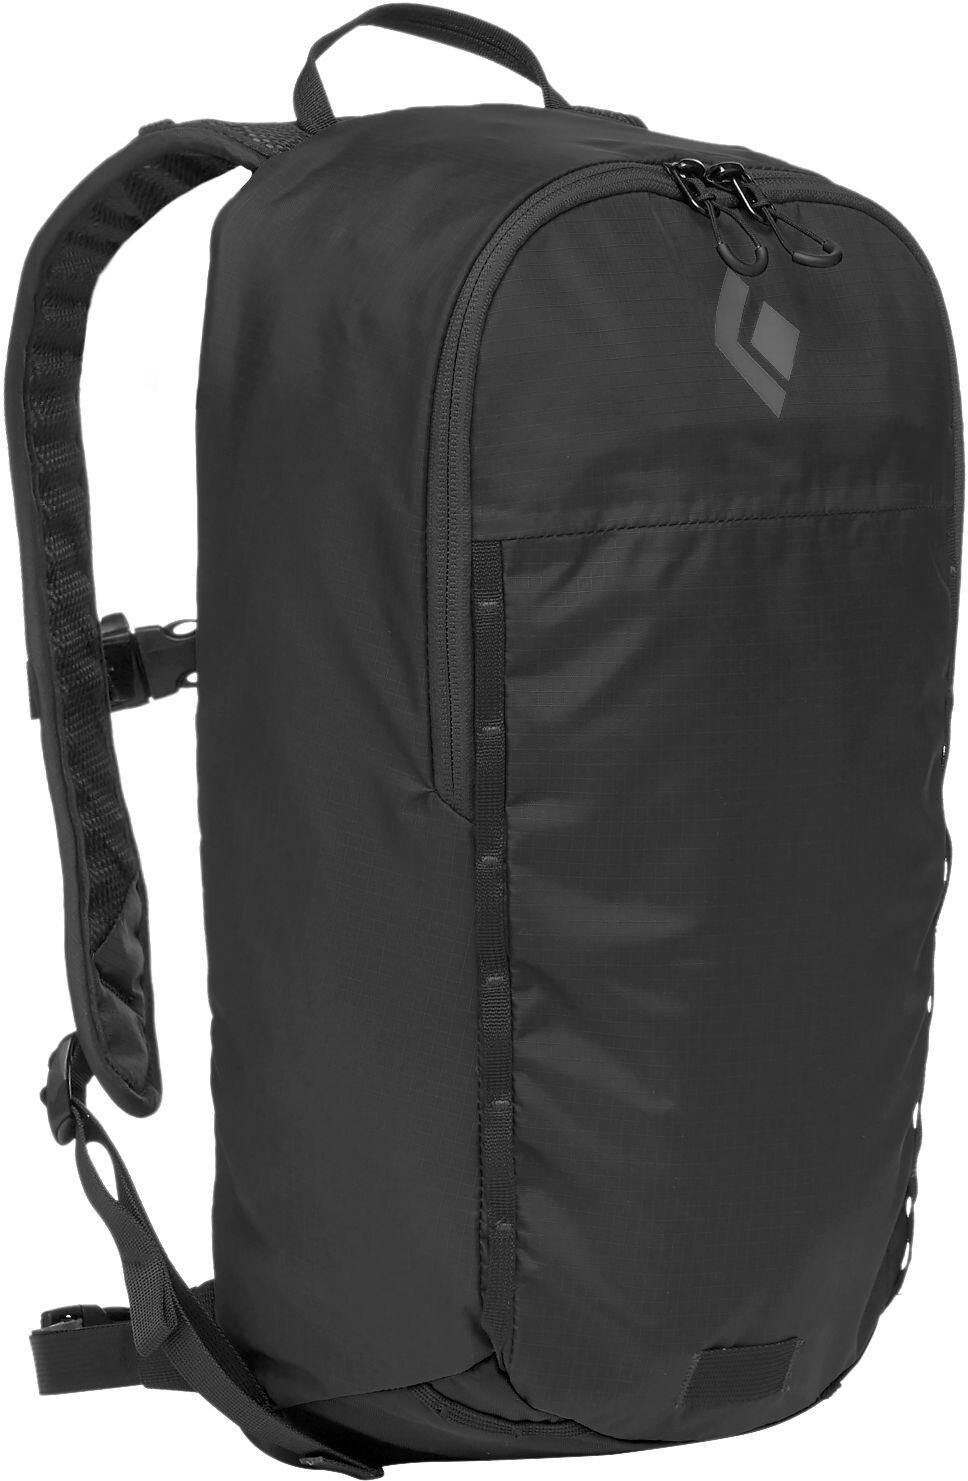 Black Diamond Bbee 11 Rygsæk, black (2019) | Travel bags